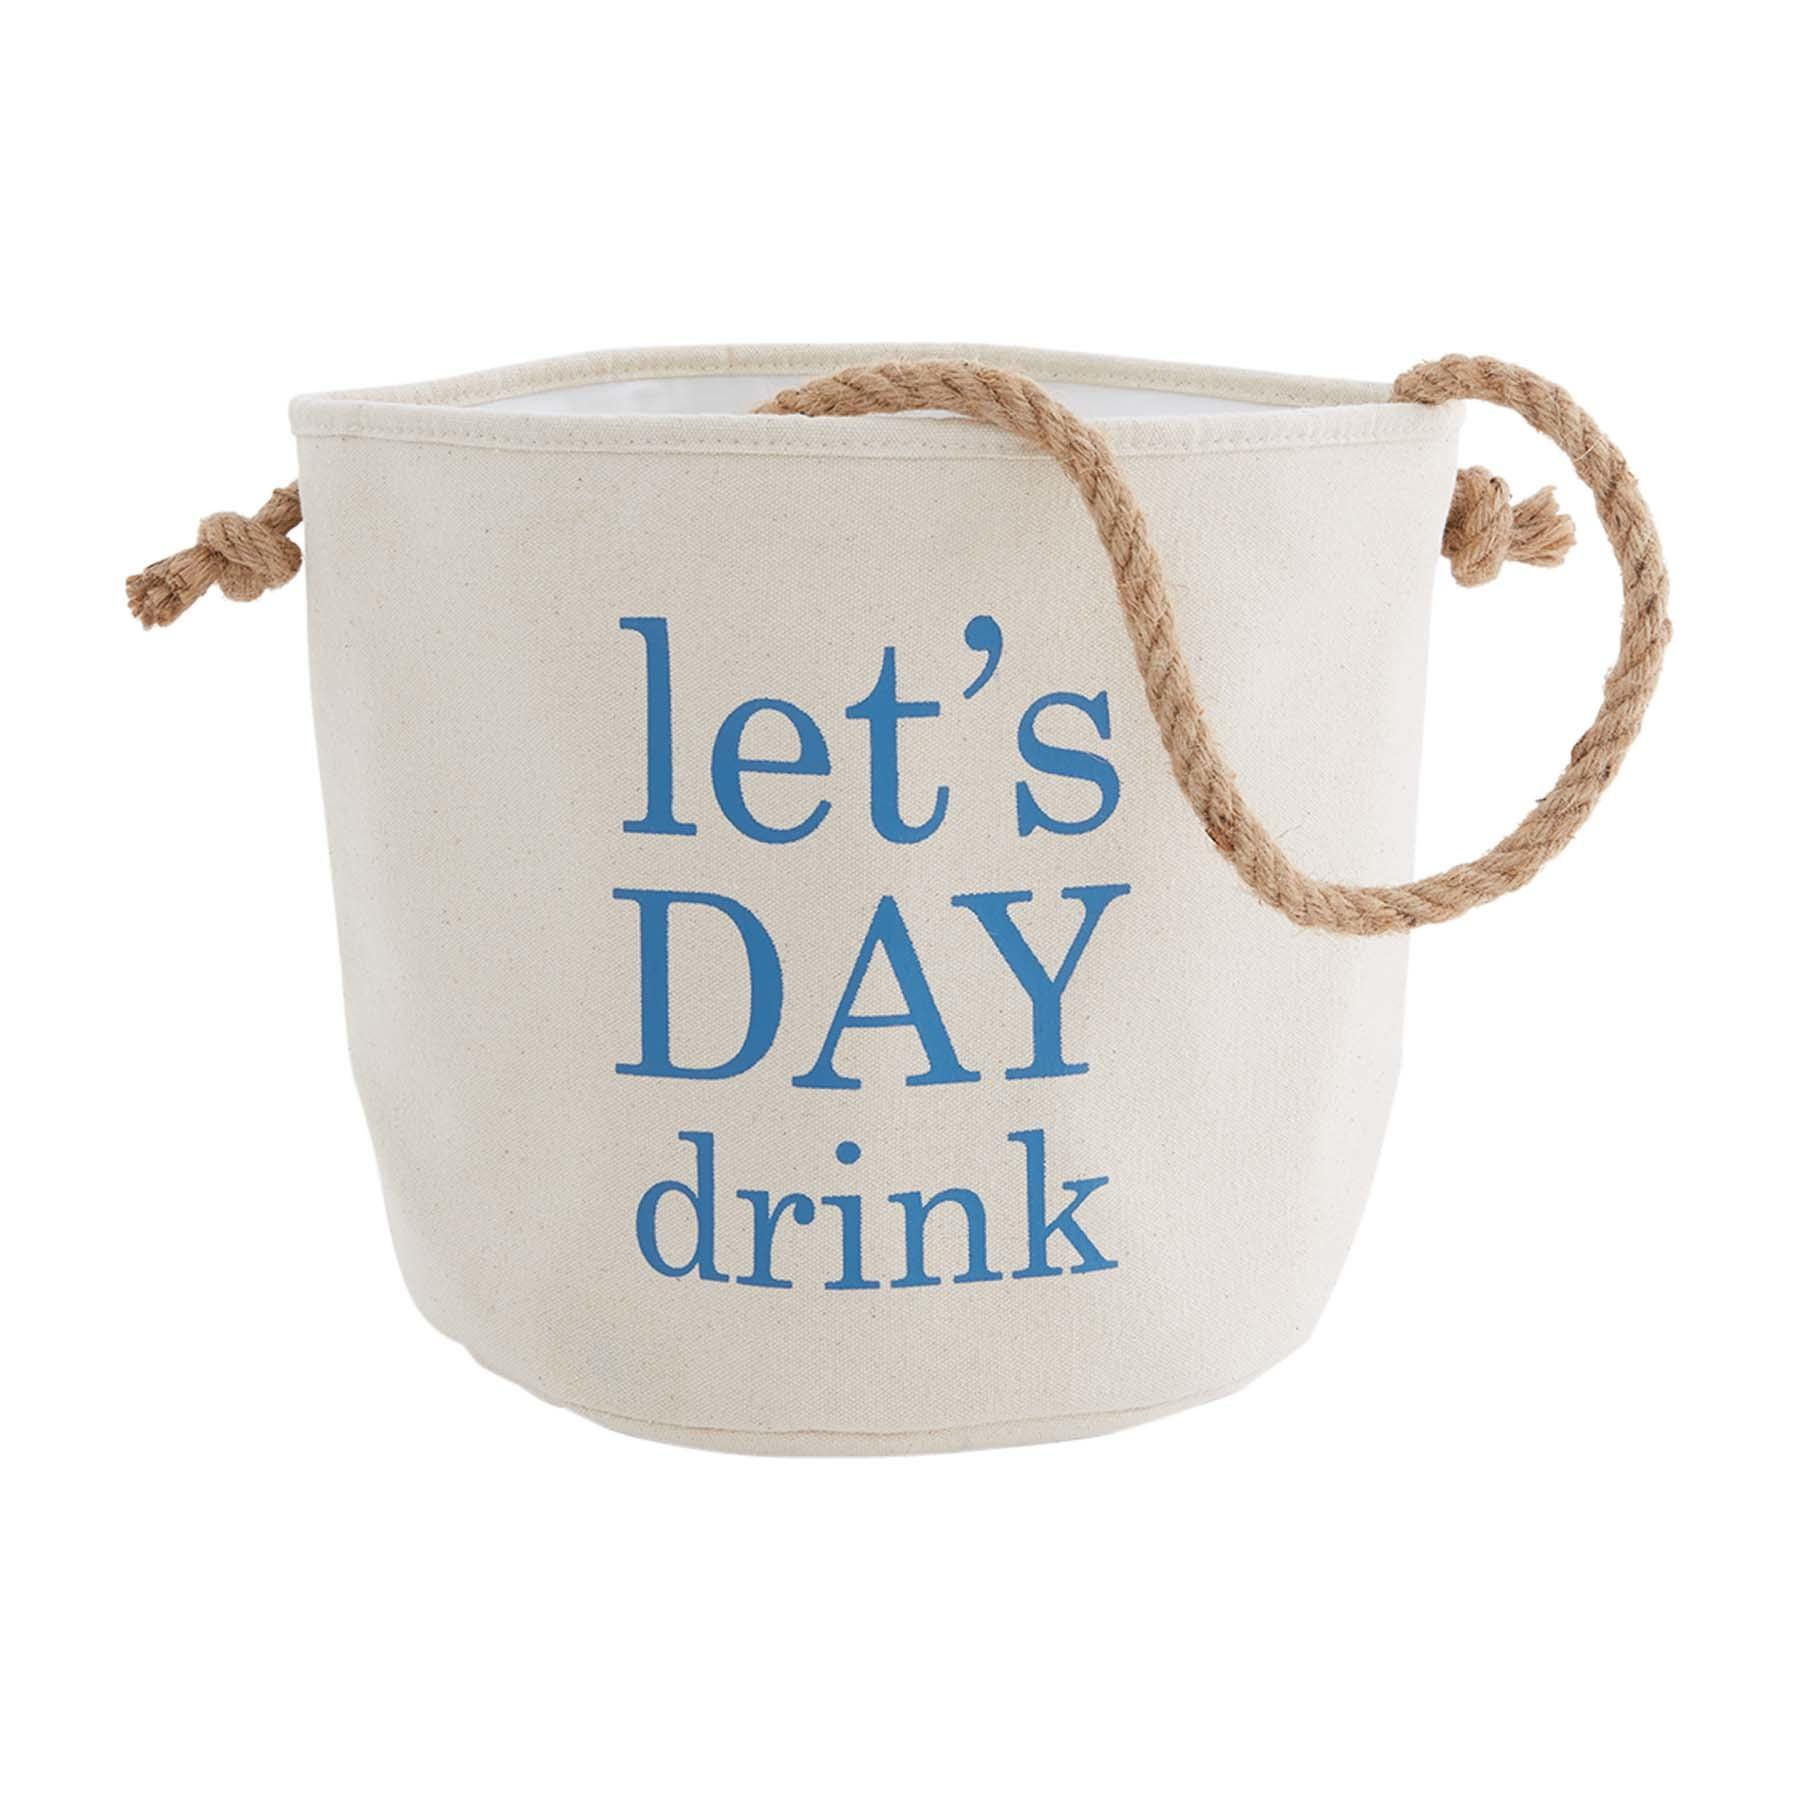 Mud Pie DAY DRINK COOLER BAG